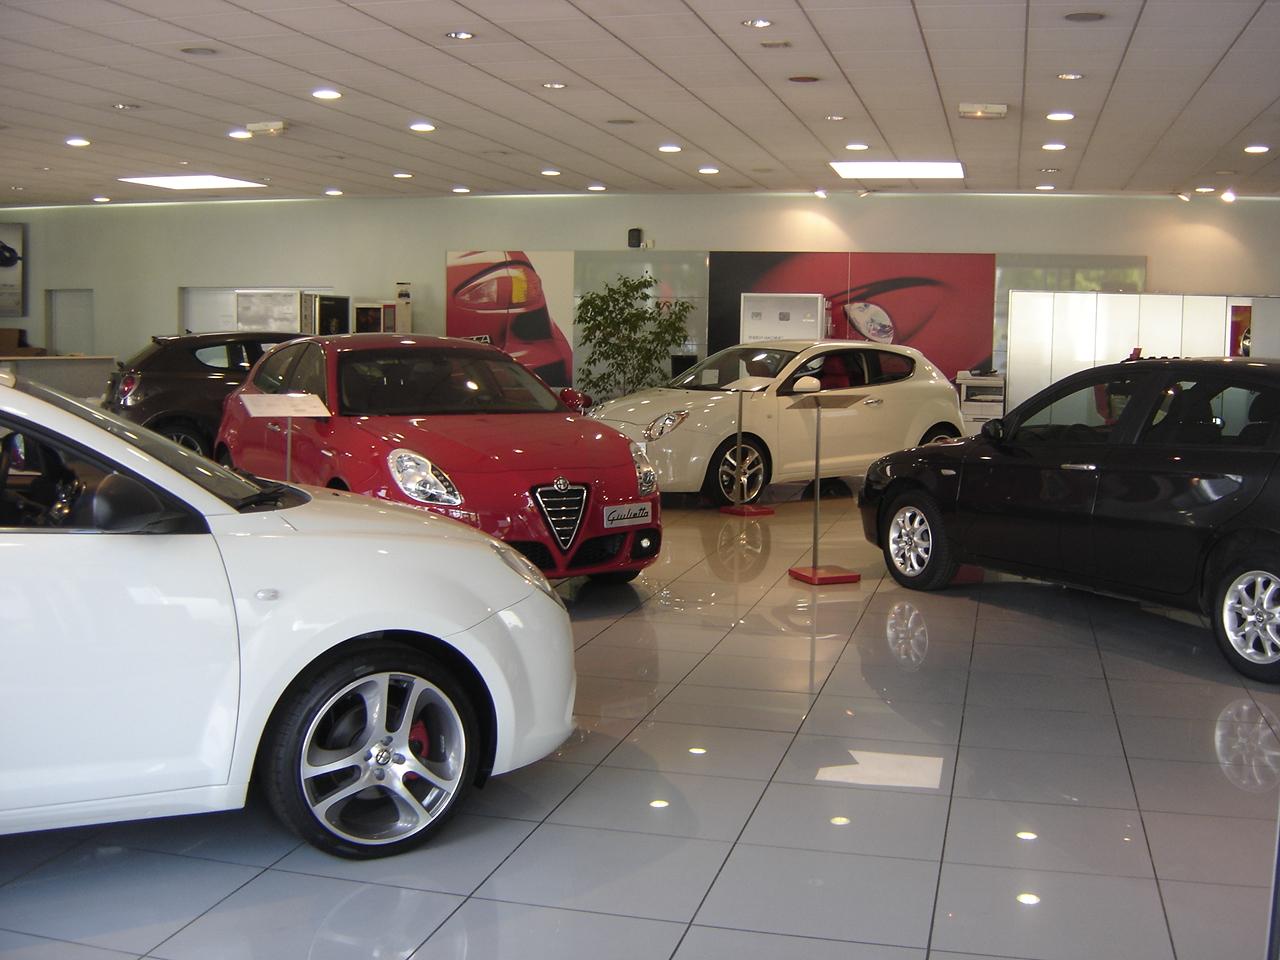 Villeneuve d 39 ascq alfa romeo dealership flickr photo for Garage alfa romeo villeneuve d ascq